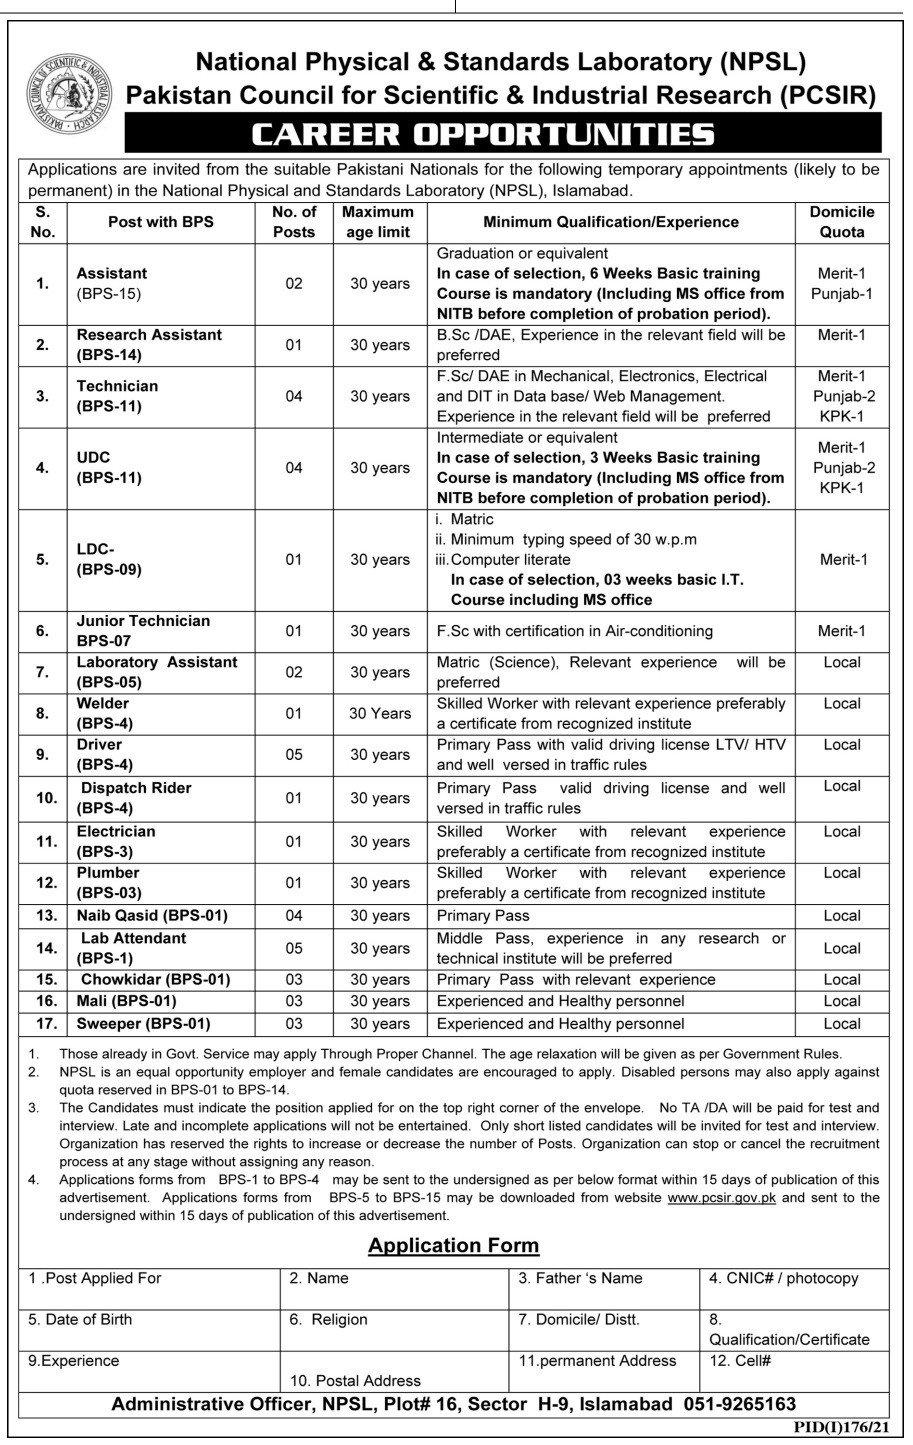 National Physical & Standard Laboratory NPSL Jobs 2021